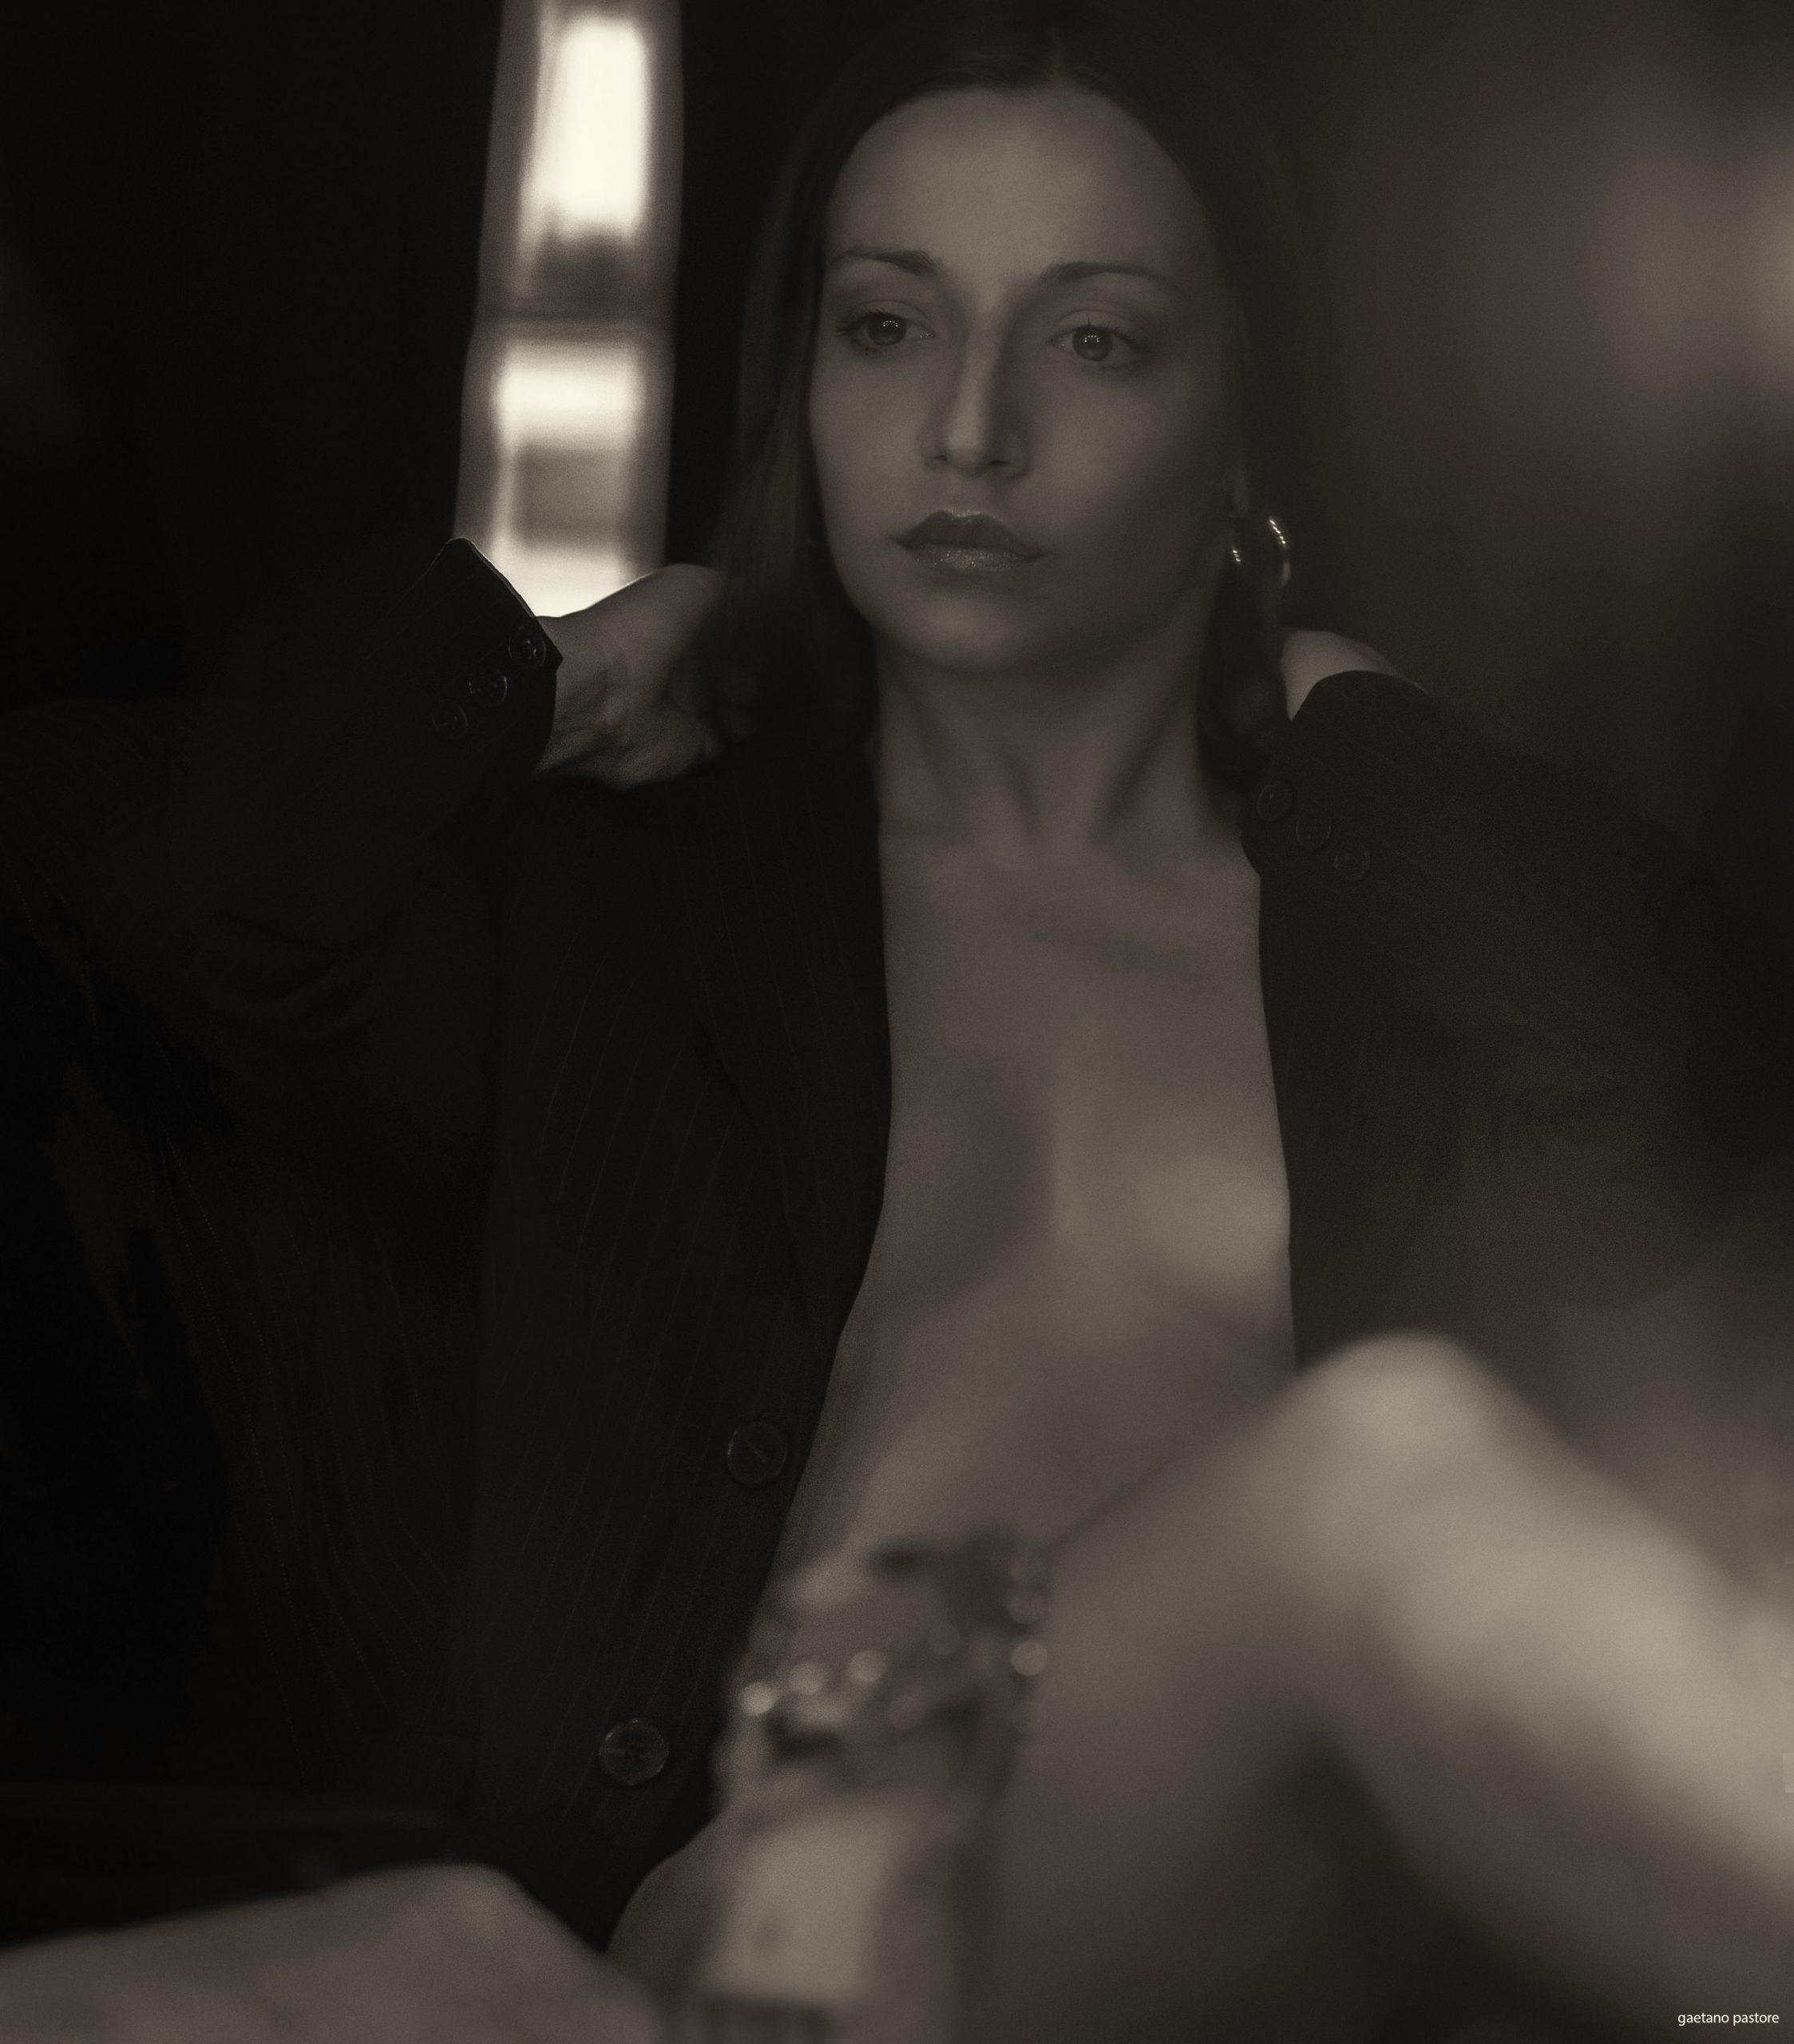 Categorie: Glamour, Portrait - Photographer: GAETANO PASTORE; Models: ALLISON BENINTENDE & CHRISTIN - Location: Roma, RM, Italia